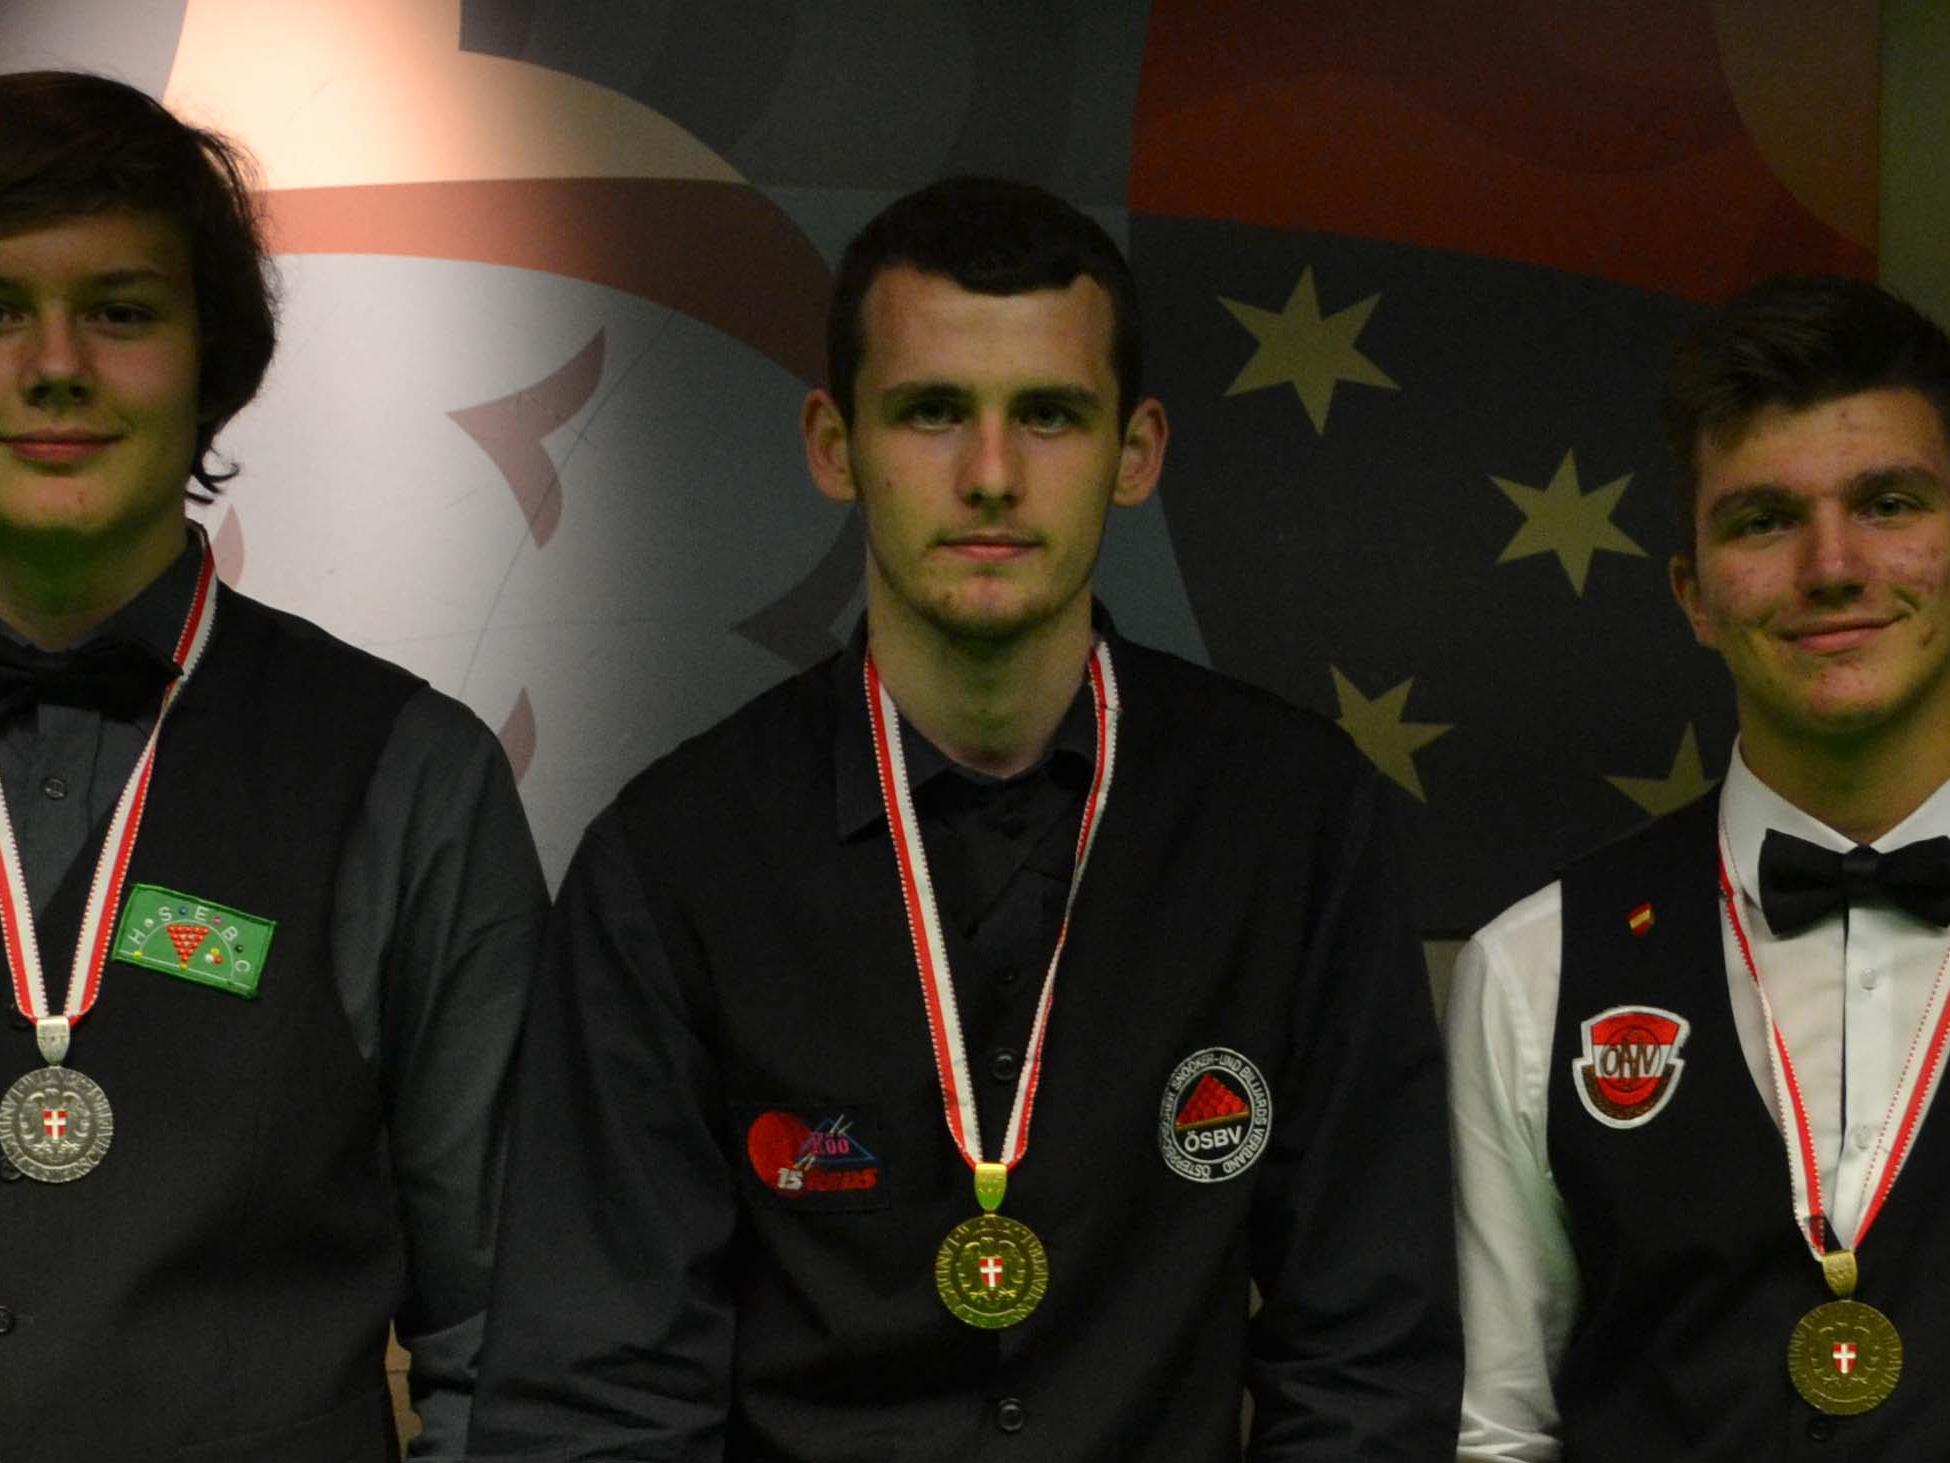 Oskar Charlesworth (2., HSEBC), Dominik Scherübl (1., 15Reds), Patrick Stift (3., HSEBC)